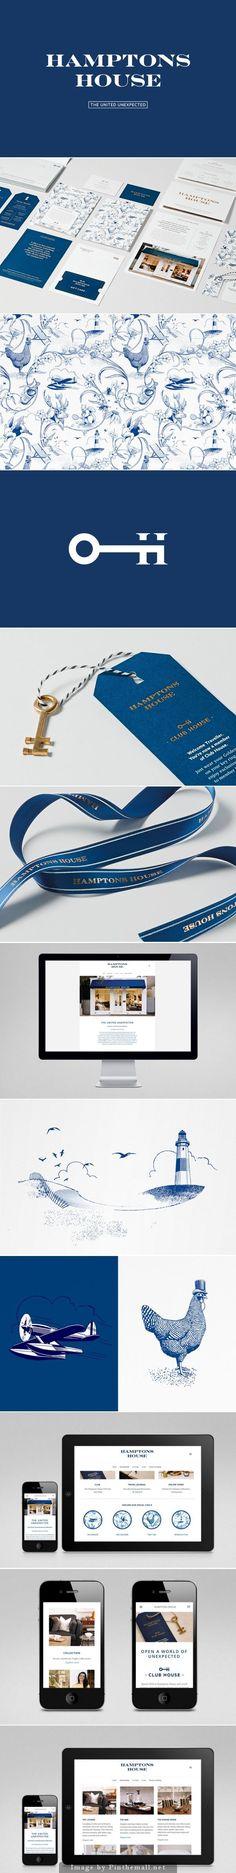 Hamptons House   Moffitt.Moffitt.  Curated by: Transition Marketing Services   Okanagan Small Business Marketing  Branding Solutions. http://www.transitionmarketing.ca